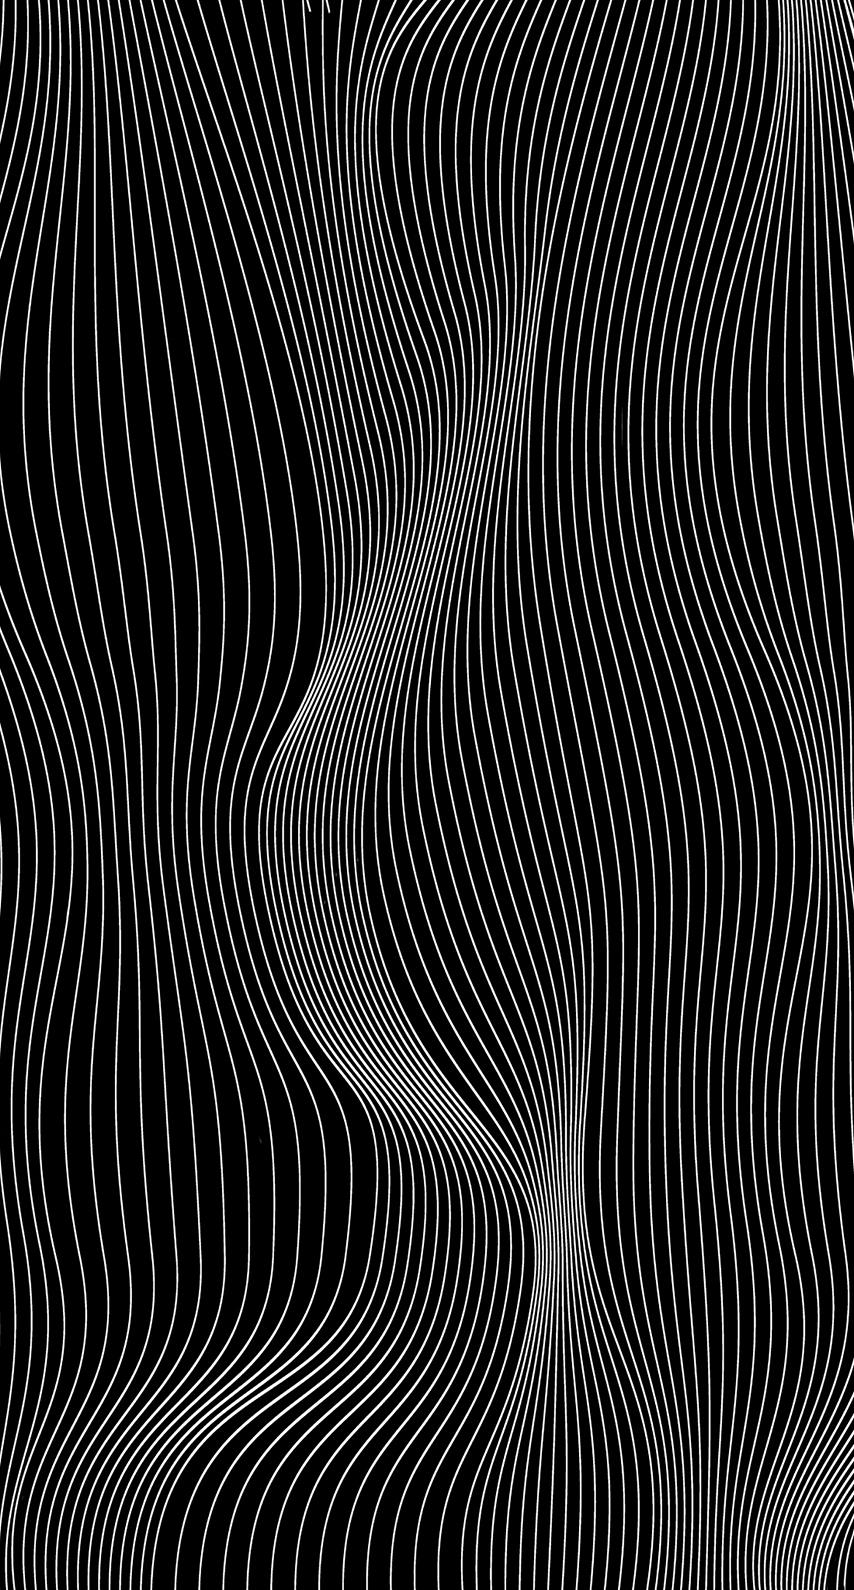 organism, monochrome photography